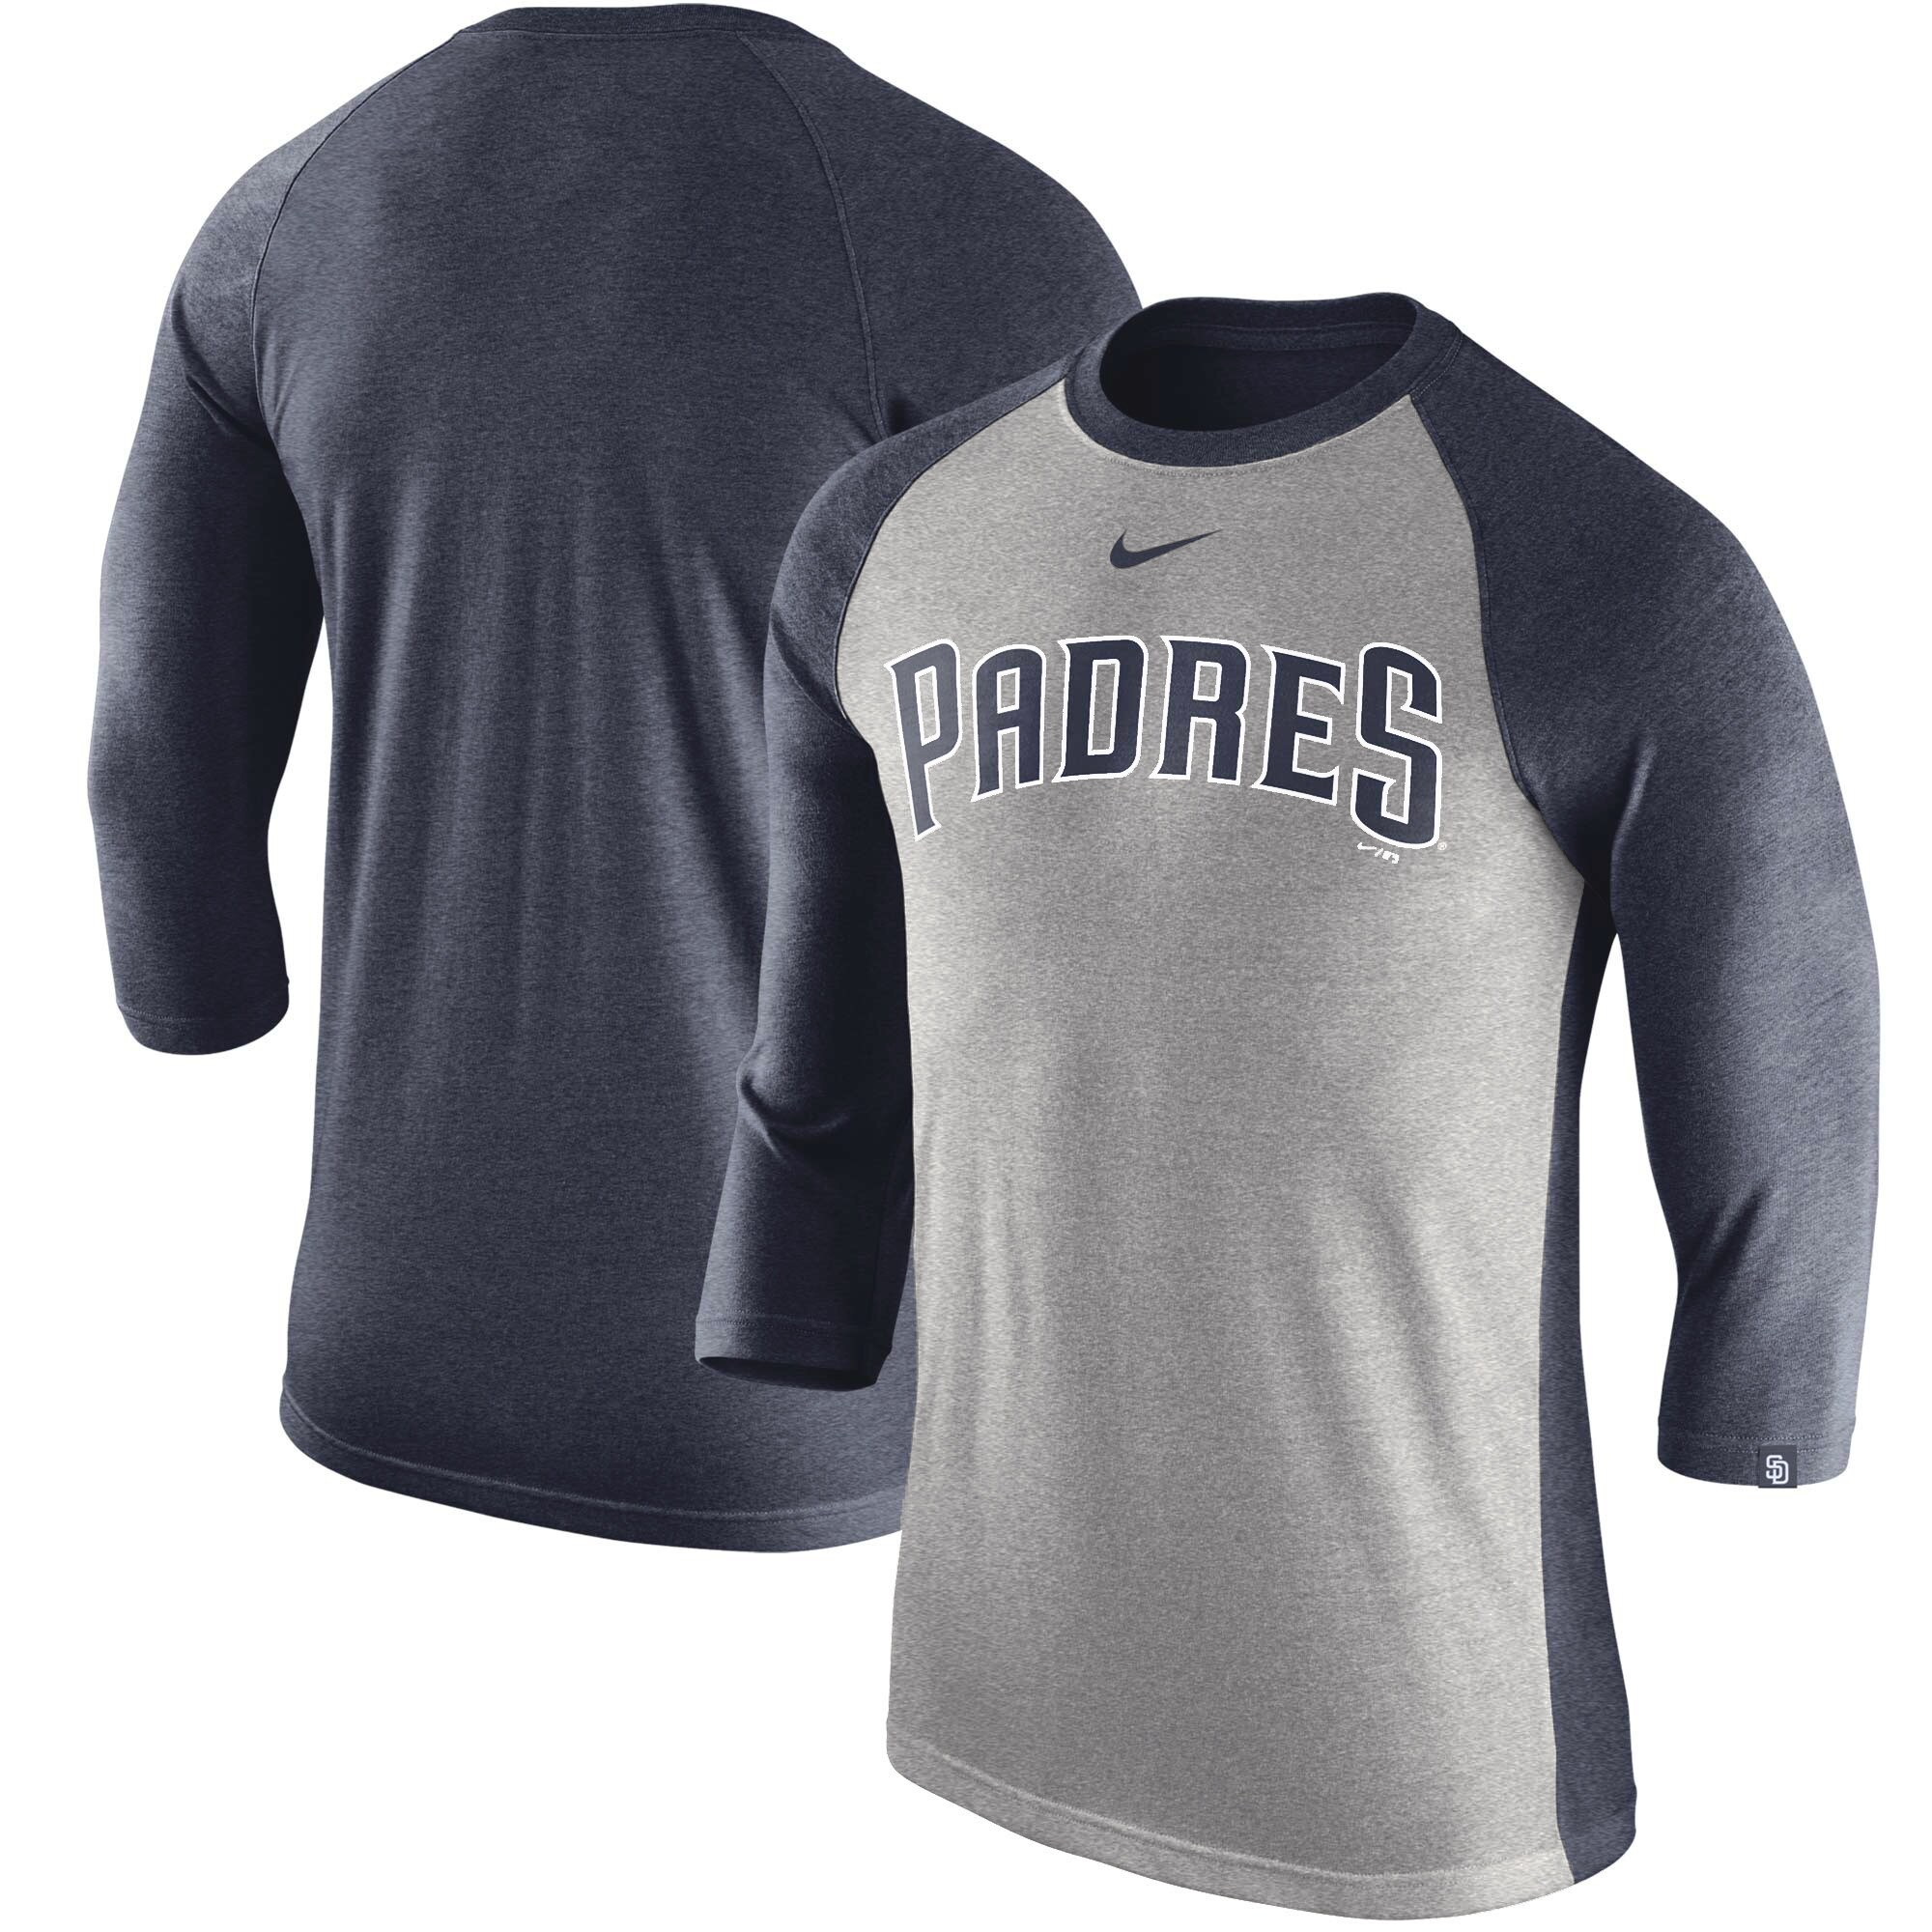 San Diego Padres Nike MLB Tri-Blend Raglan 3/4-Sleeve T-Shirt - Gray/Navy